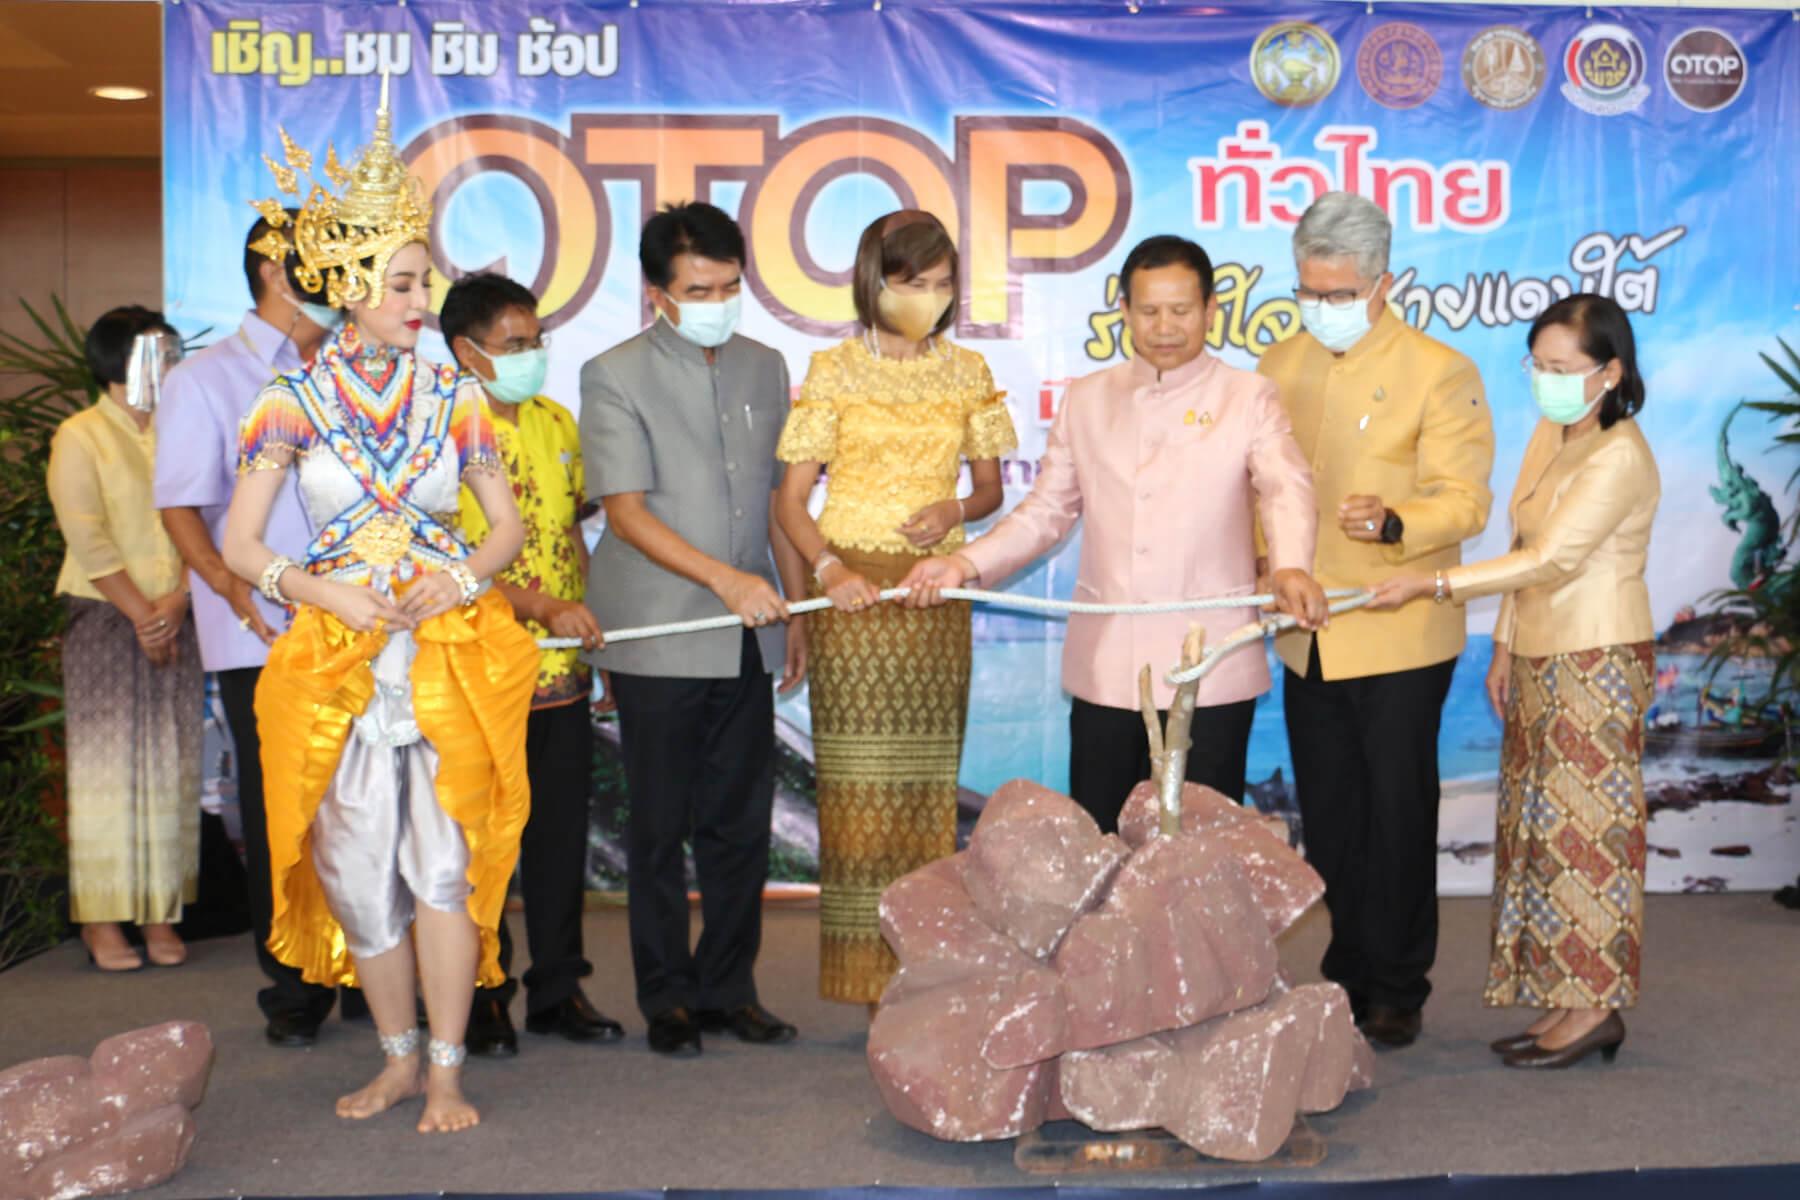 OTOP ทั่วไทย ICC HATYAI ศูนย์ประชุมนานาชาติฉลองสิริราชสมบัติครบ ๖๐ ปี